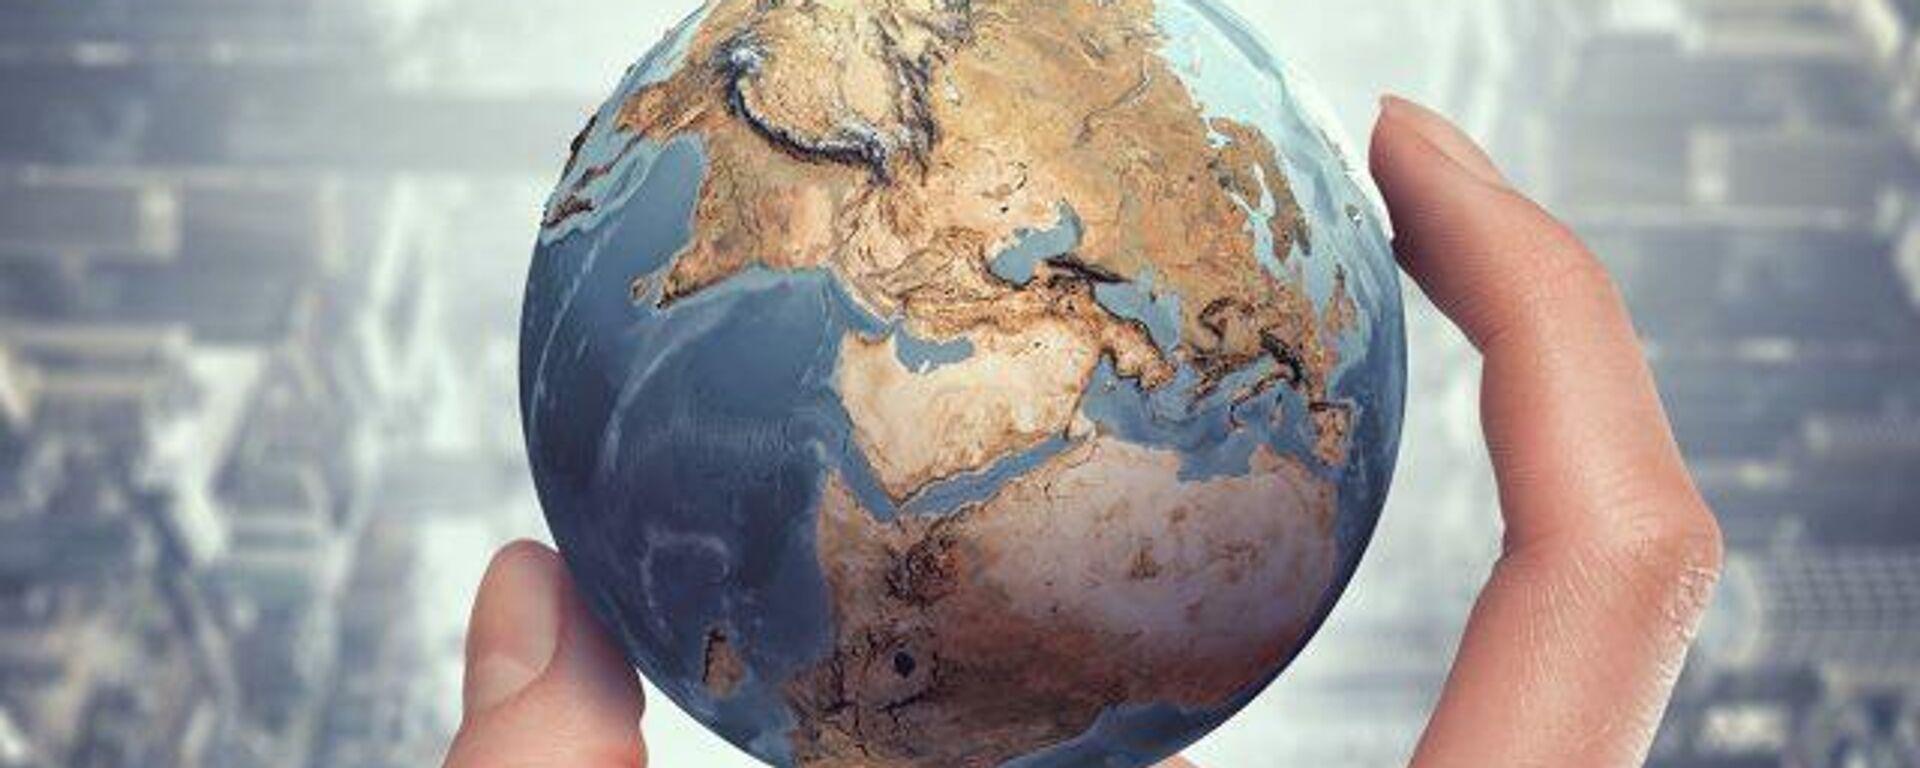 Chile pretende reglamentar territorios que son de soberanía argentina  - Sputnik Mundo, 1920, 30.08.2021